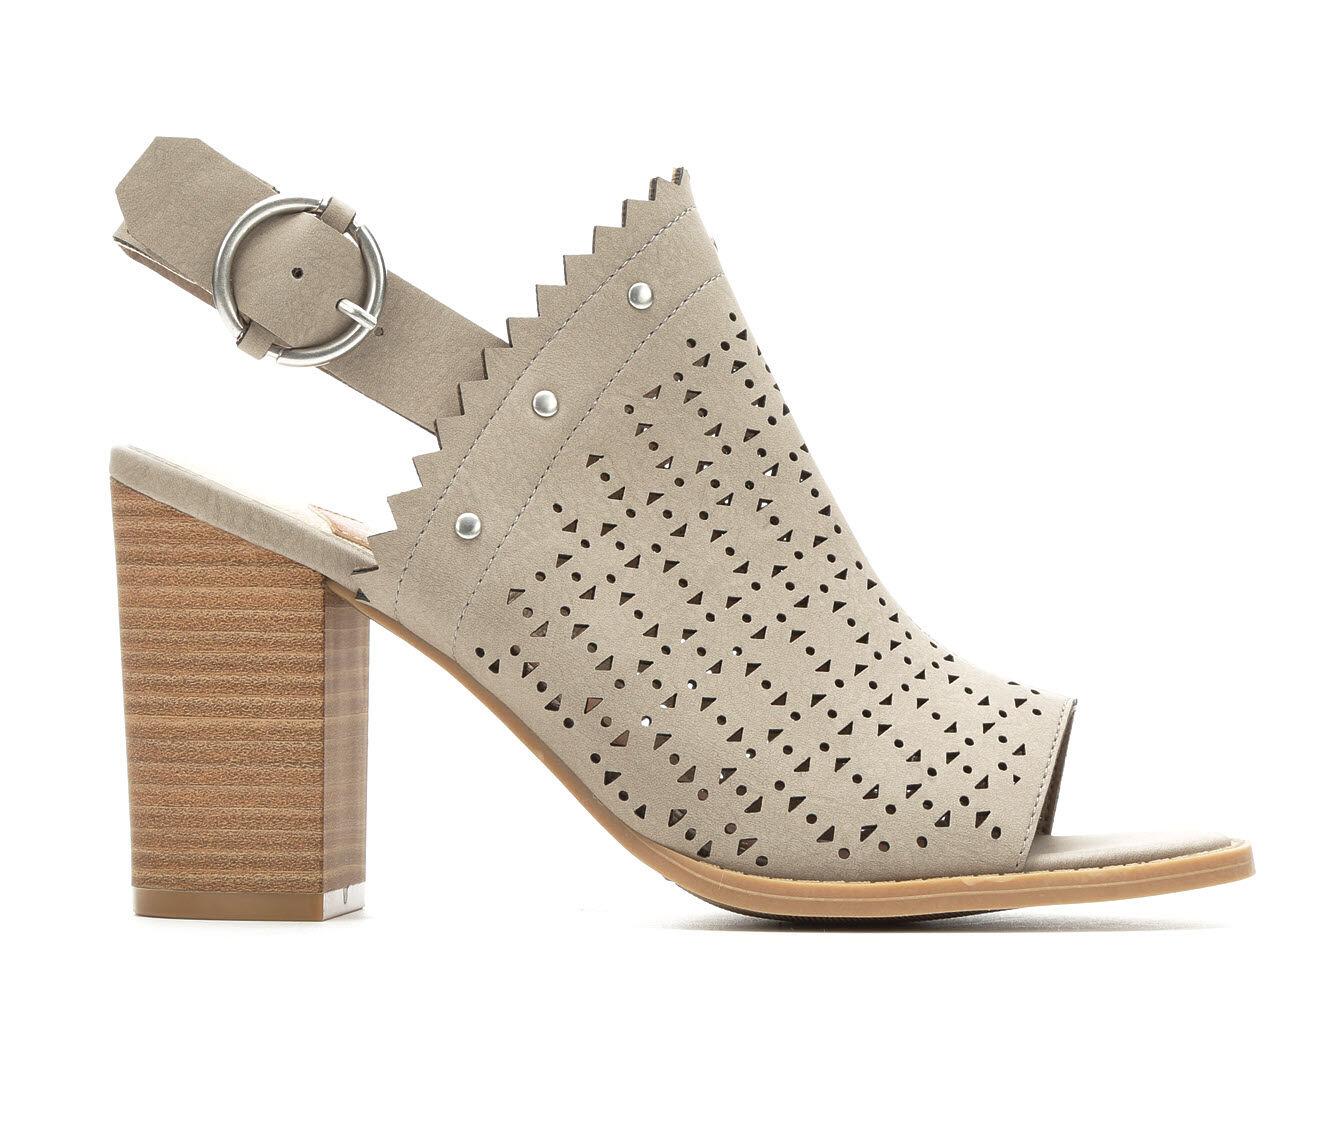 uk shoes_kd6618